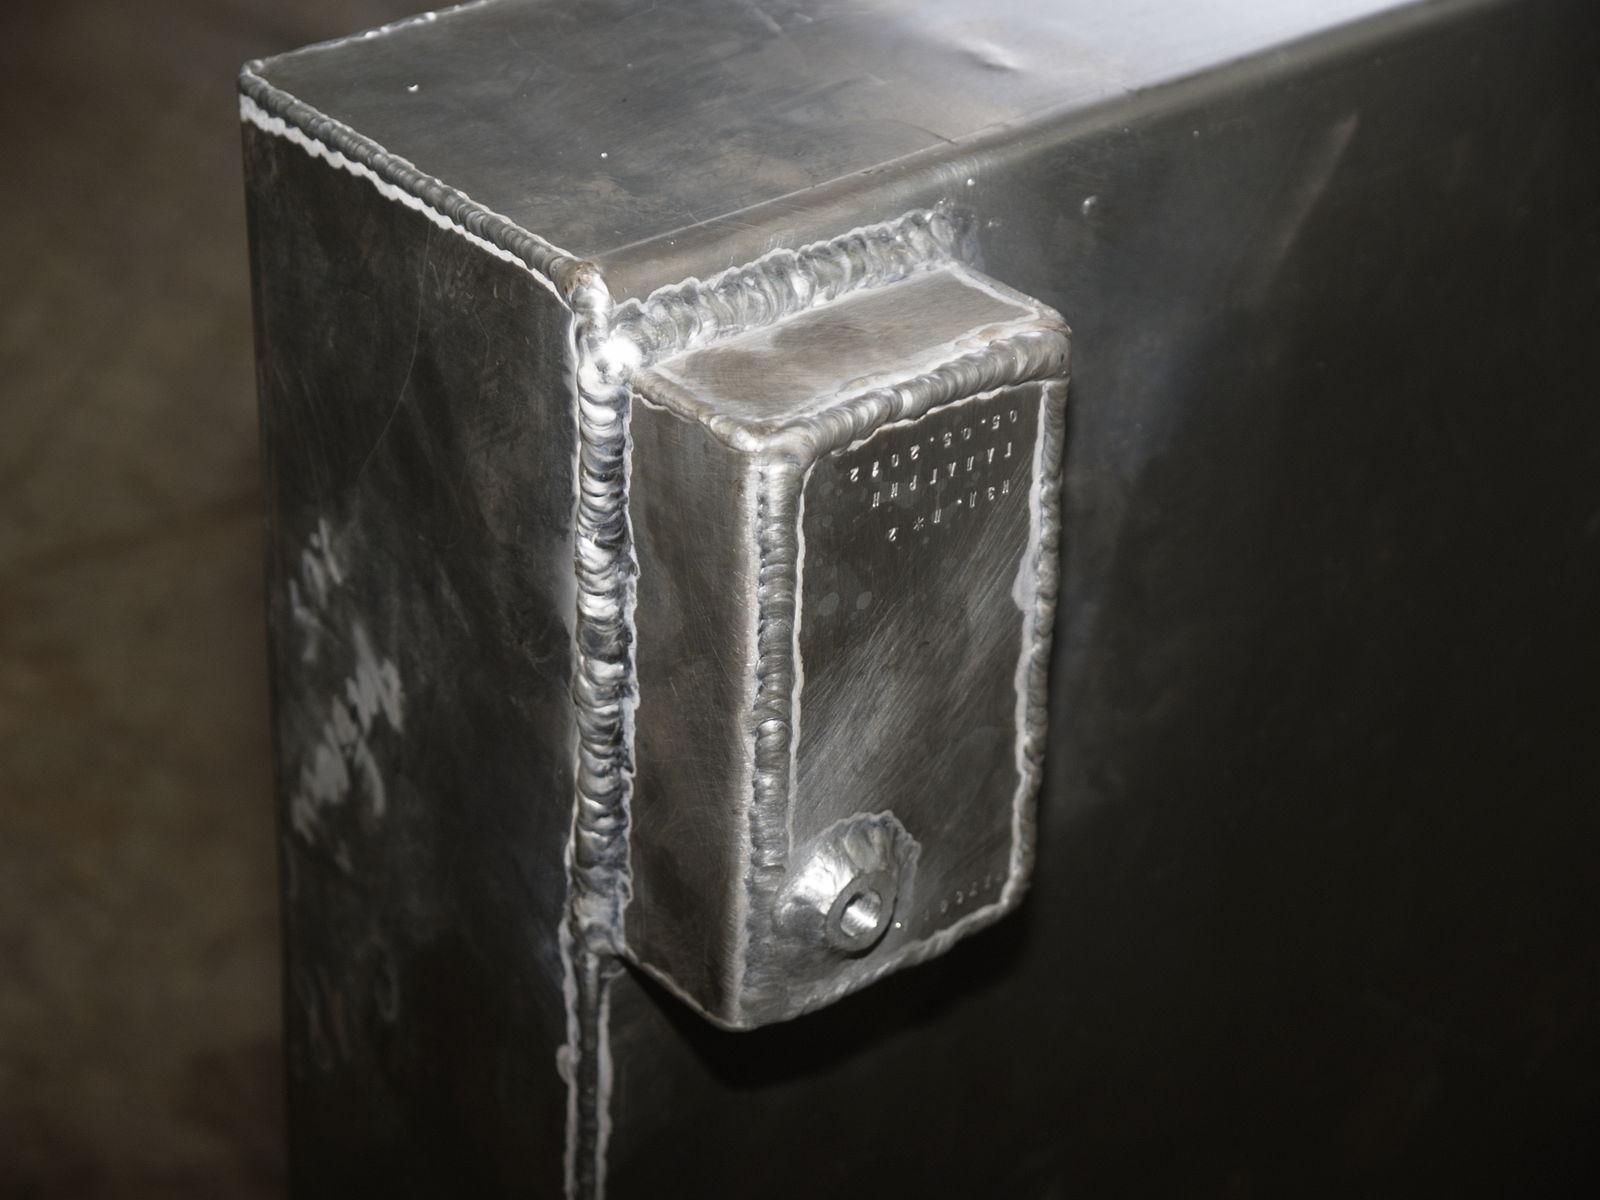 Баки УАЗ вагонной компоновки (буханка)